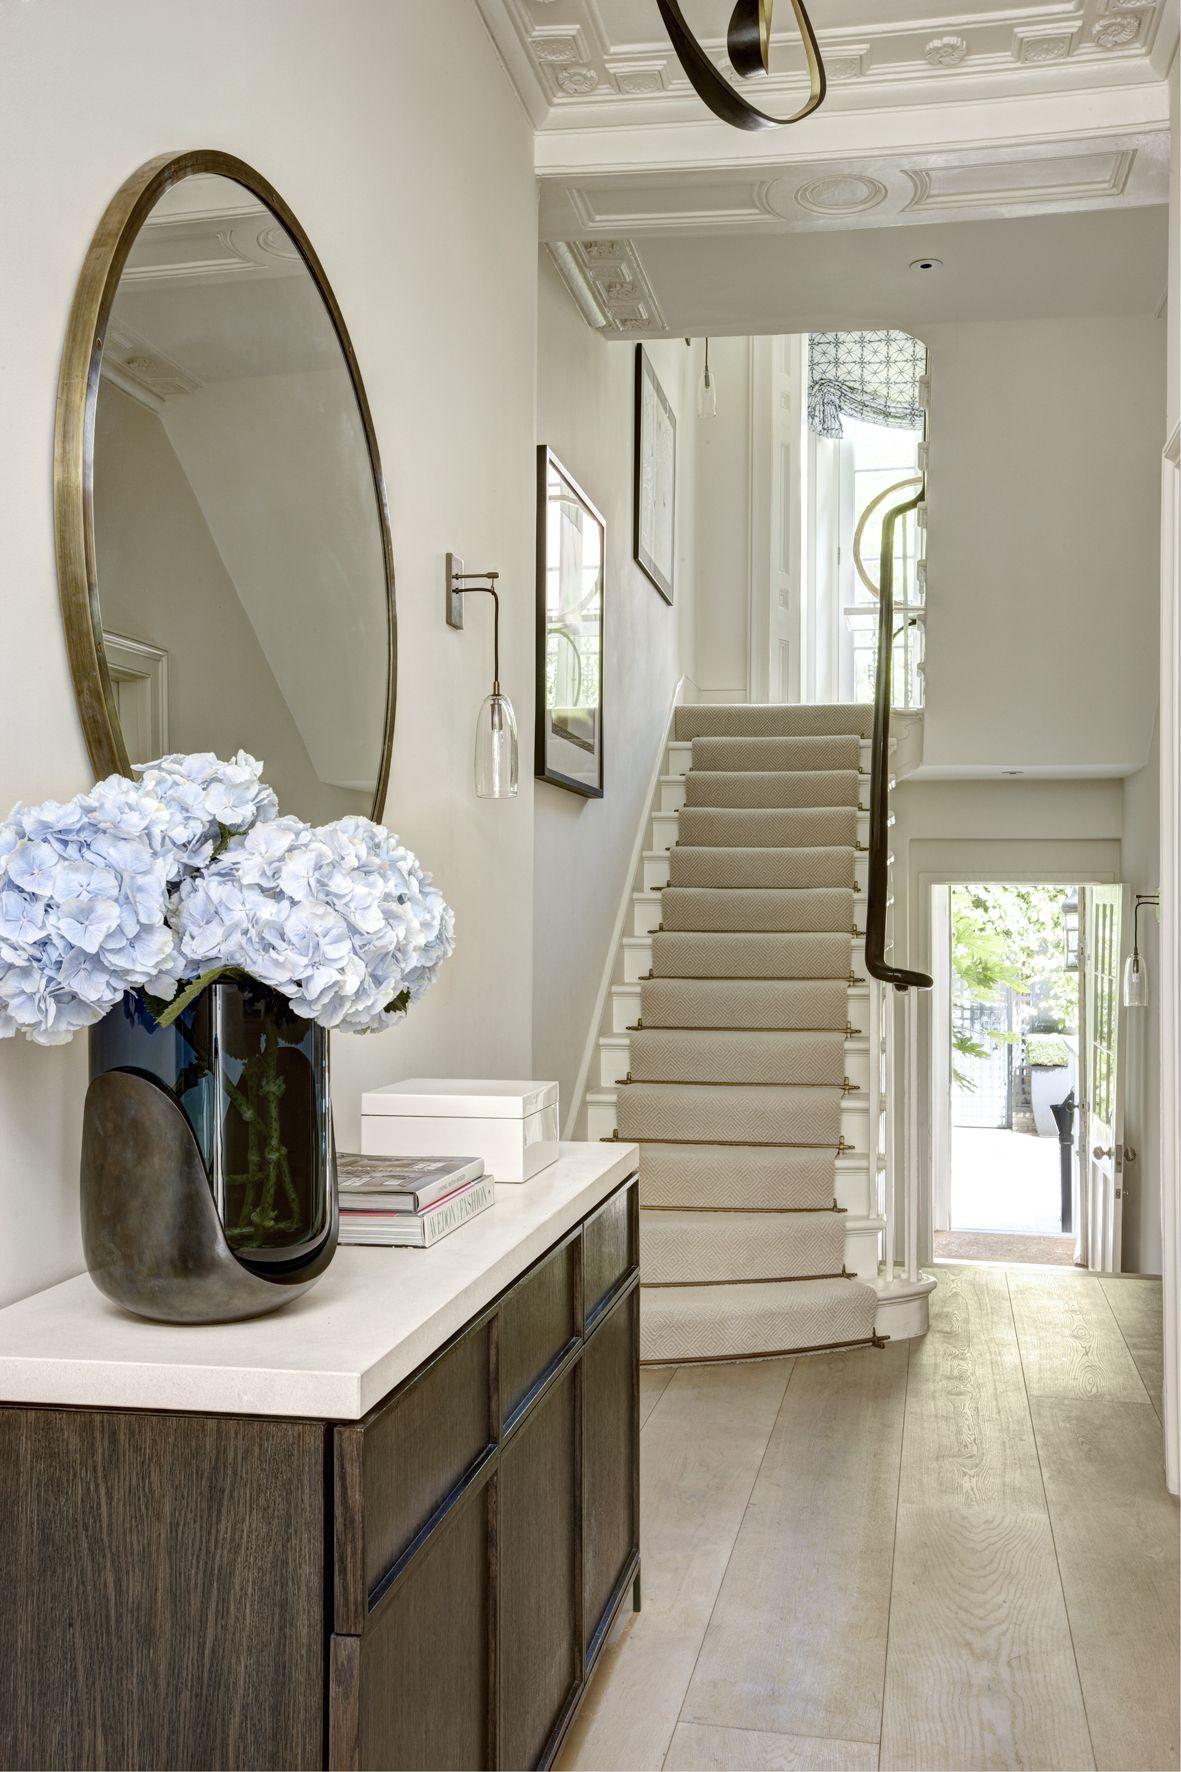 Entry hallway furniture  Simple and elegant entry way  Decoratıon  Pinterest  Town house